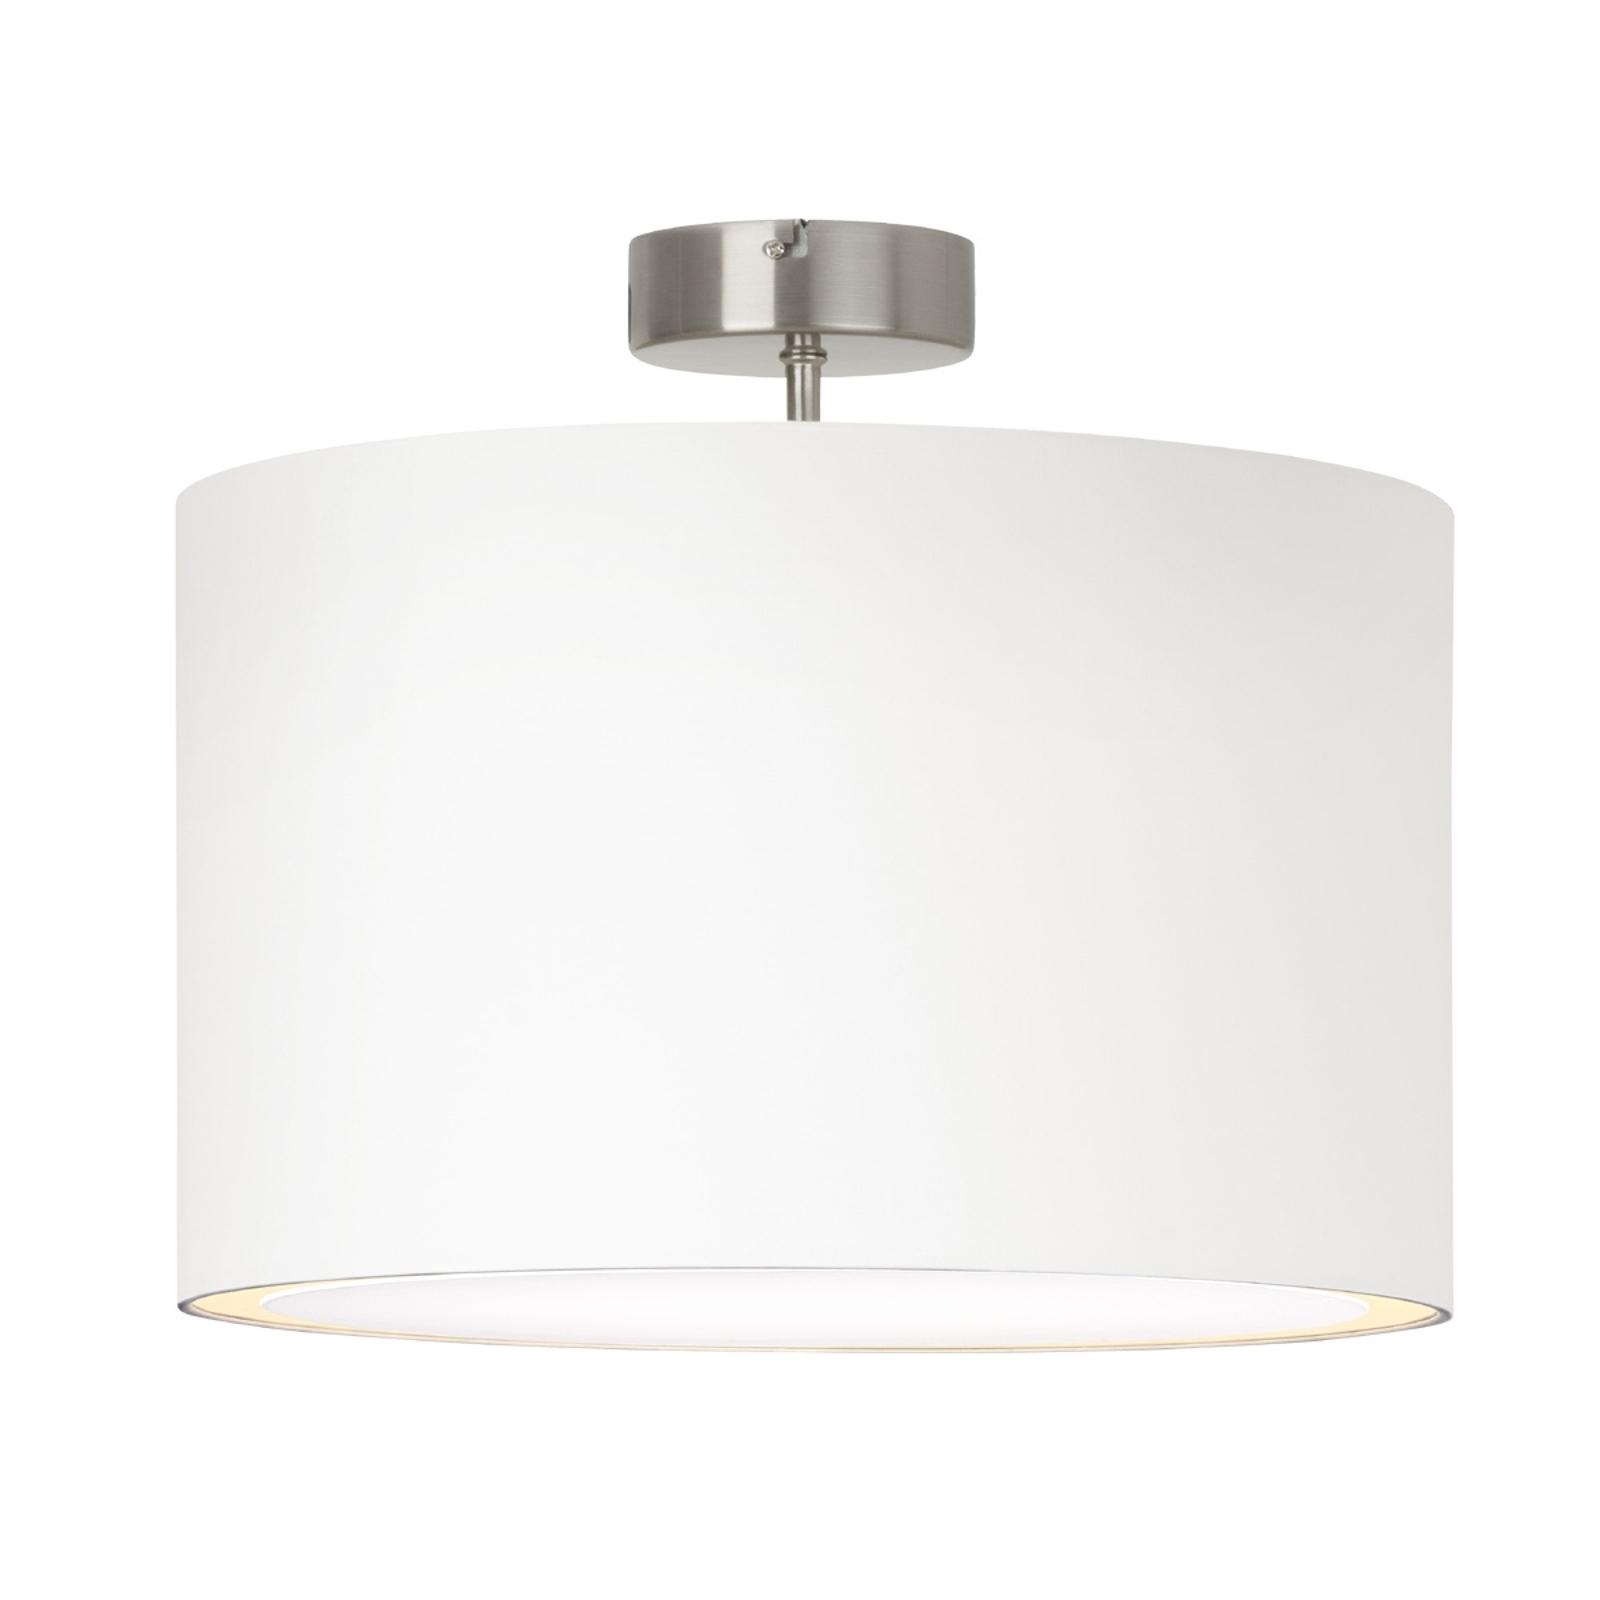 Simple ceiling light Clarie_1508796_1